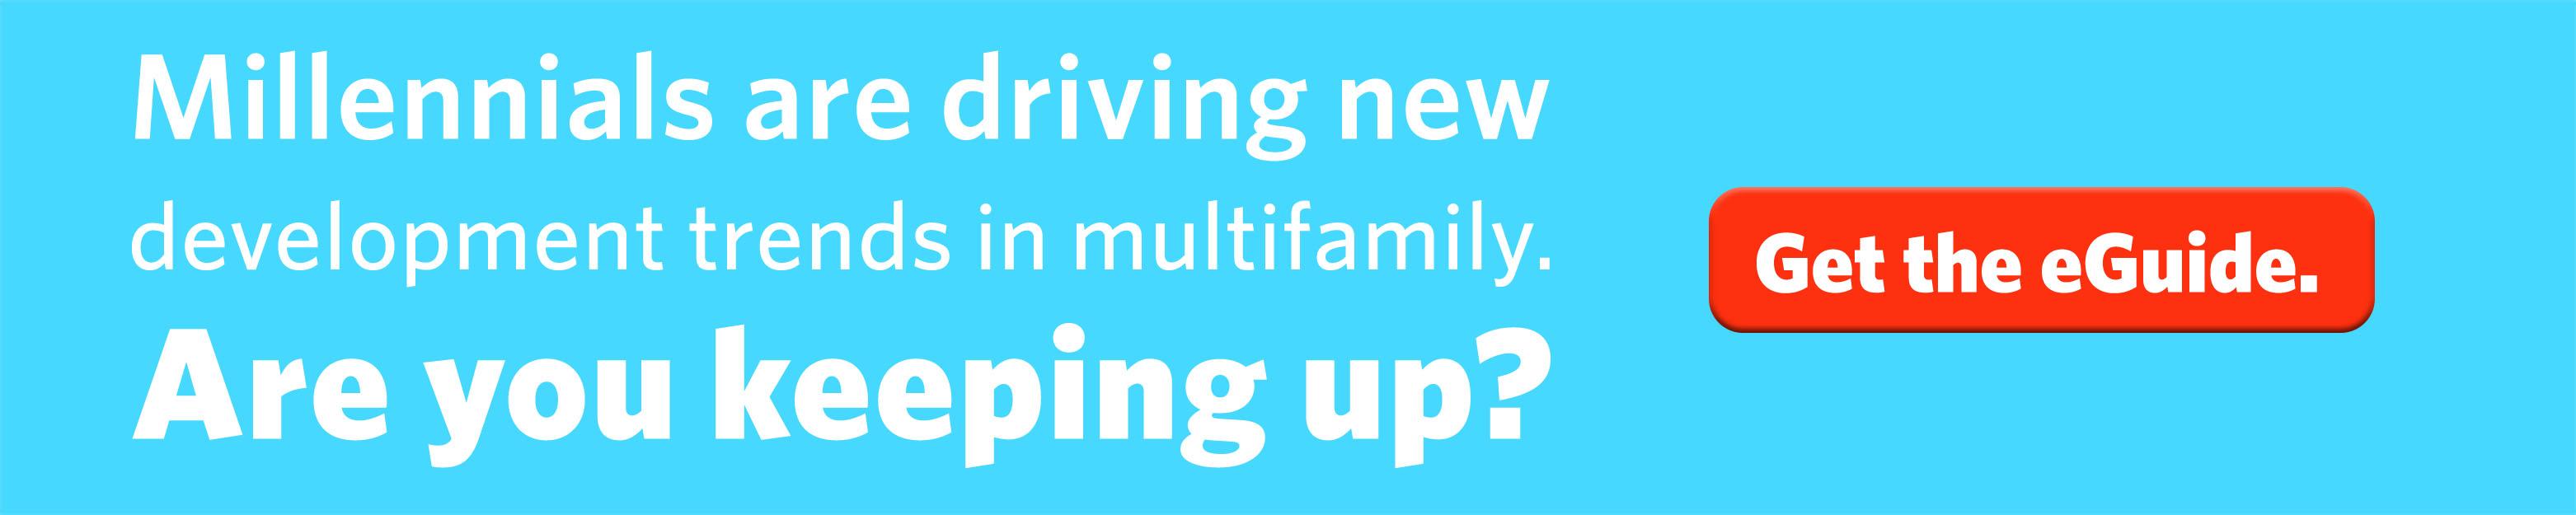 millennial-multifamily-development-trends-cta